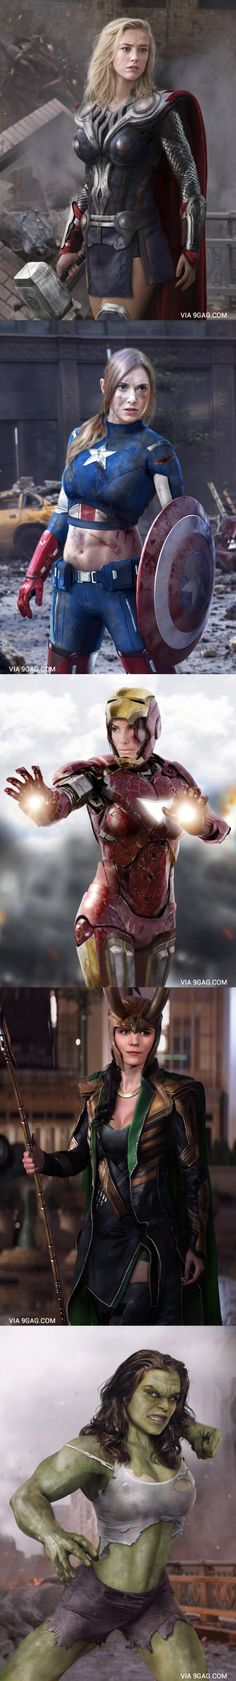 Sexy Avenger